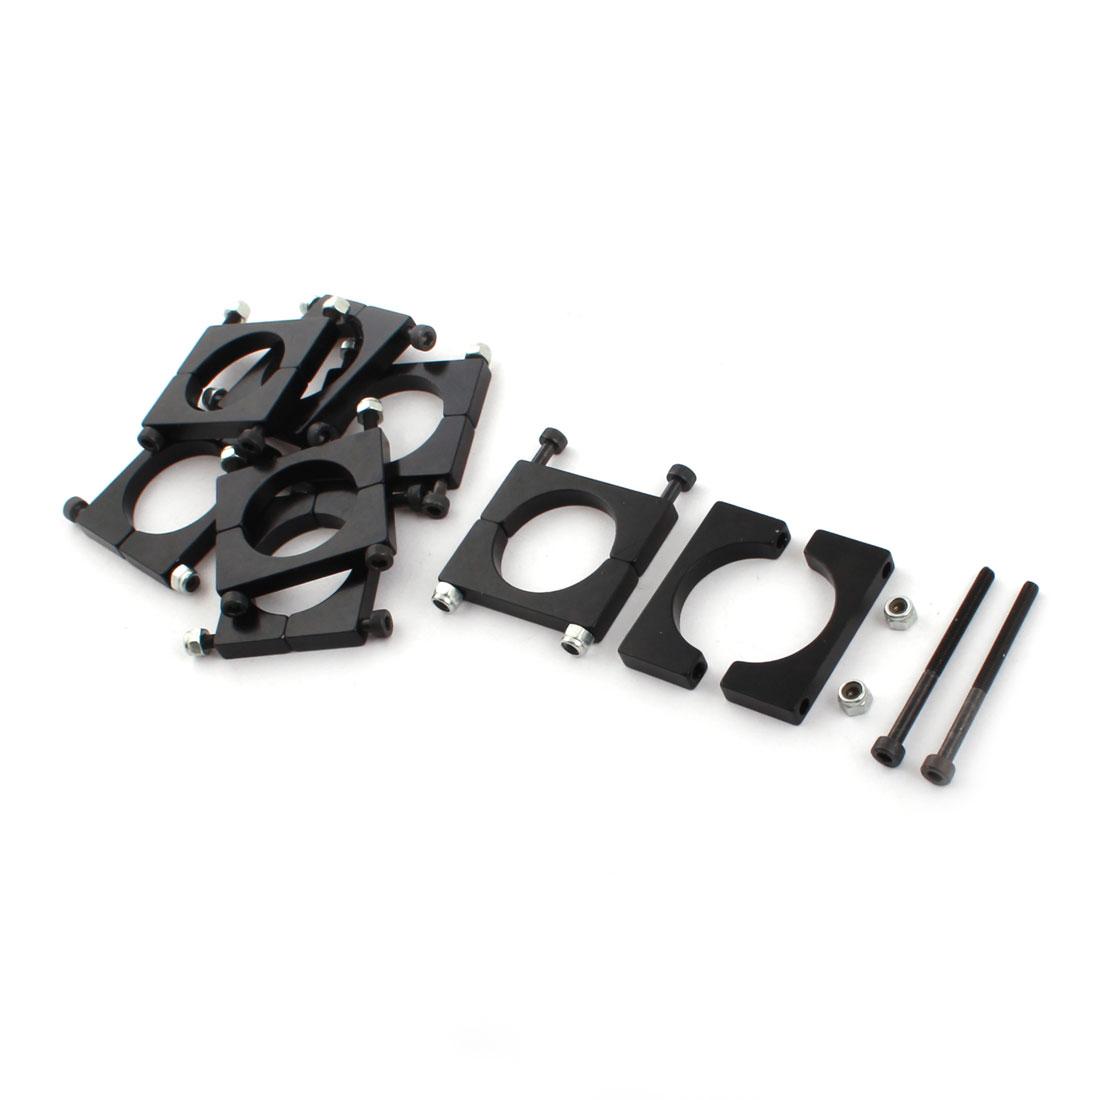 8 Pcs 25mm Black Aluminum Clamp for Carbon Fiber Tube RC Quadcopter Hexrcopter